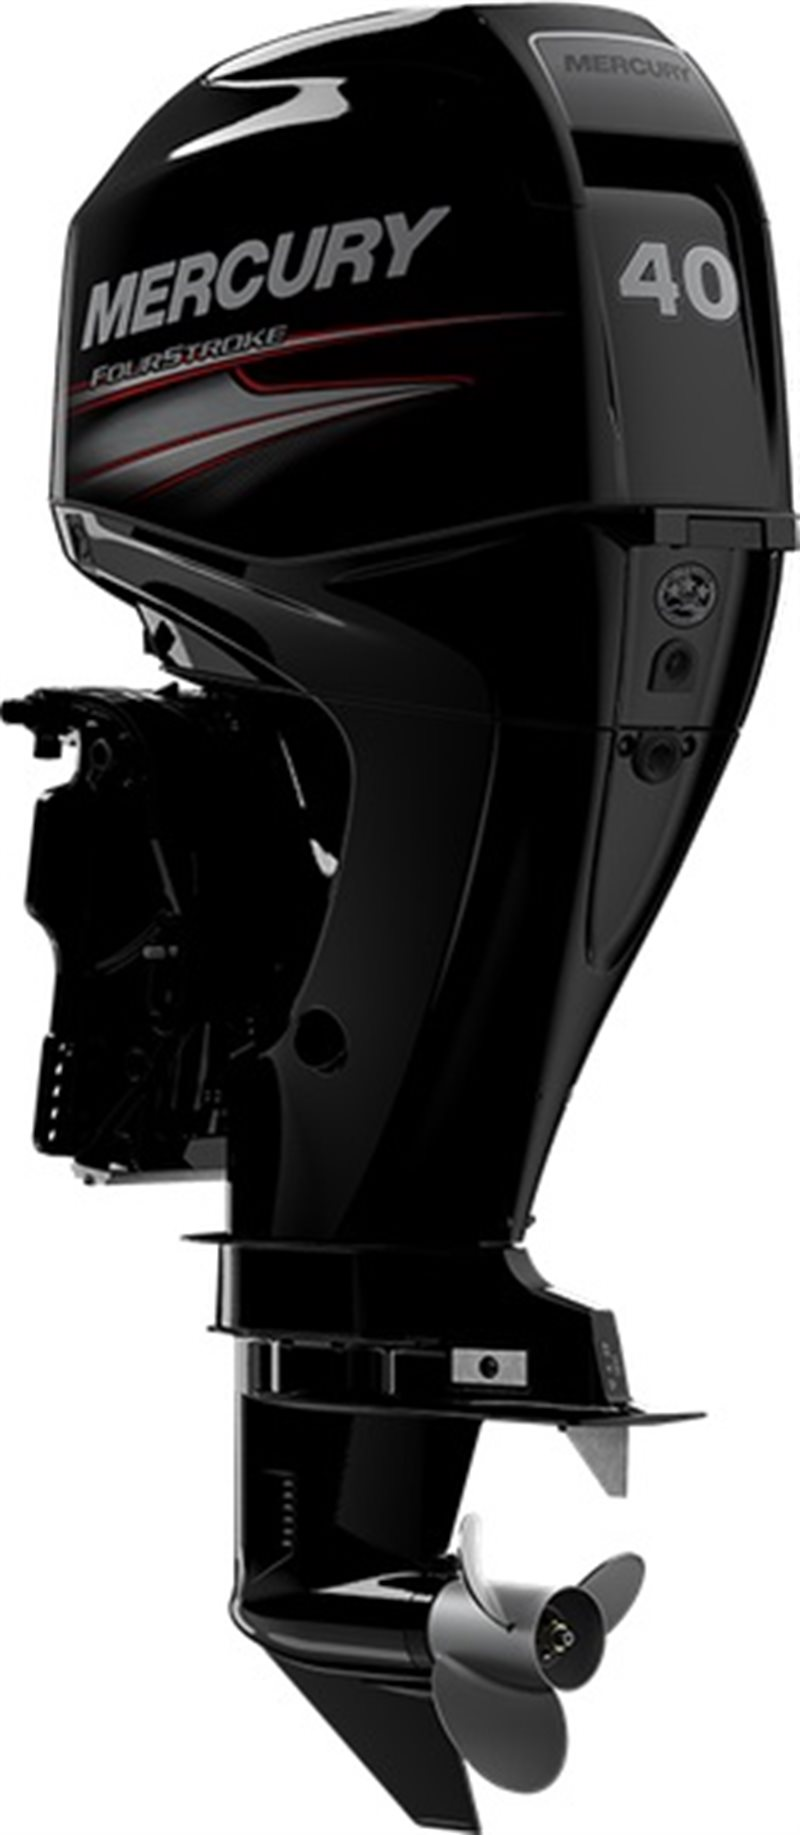 2021 Mercury Outboard FourStroke 40-60 hp 40 4-Cylinder at Pharo Marine, Waunakee, WI 53597